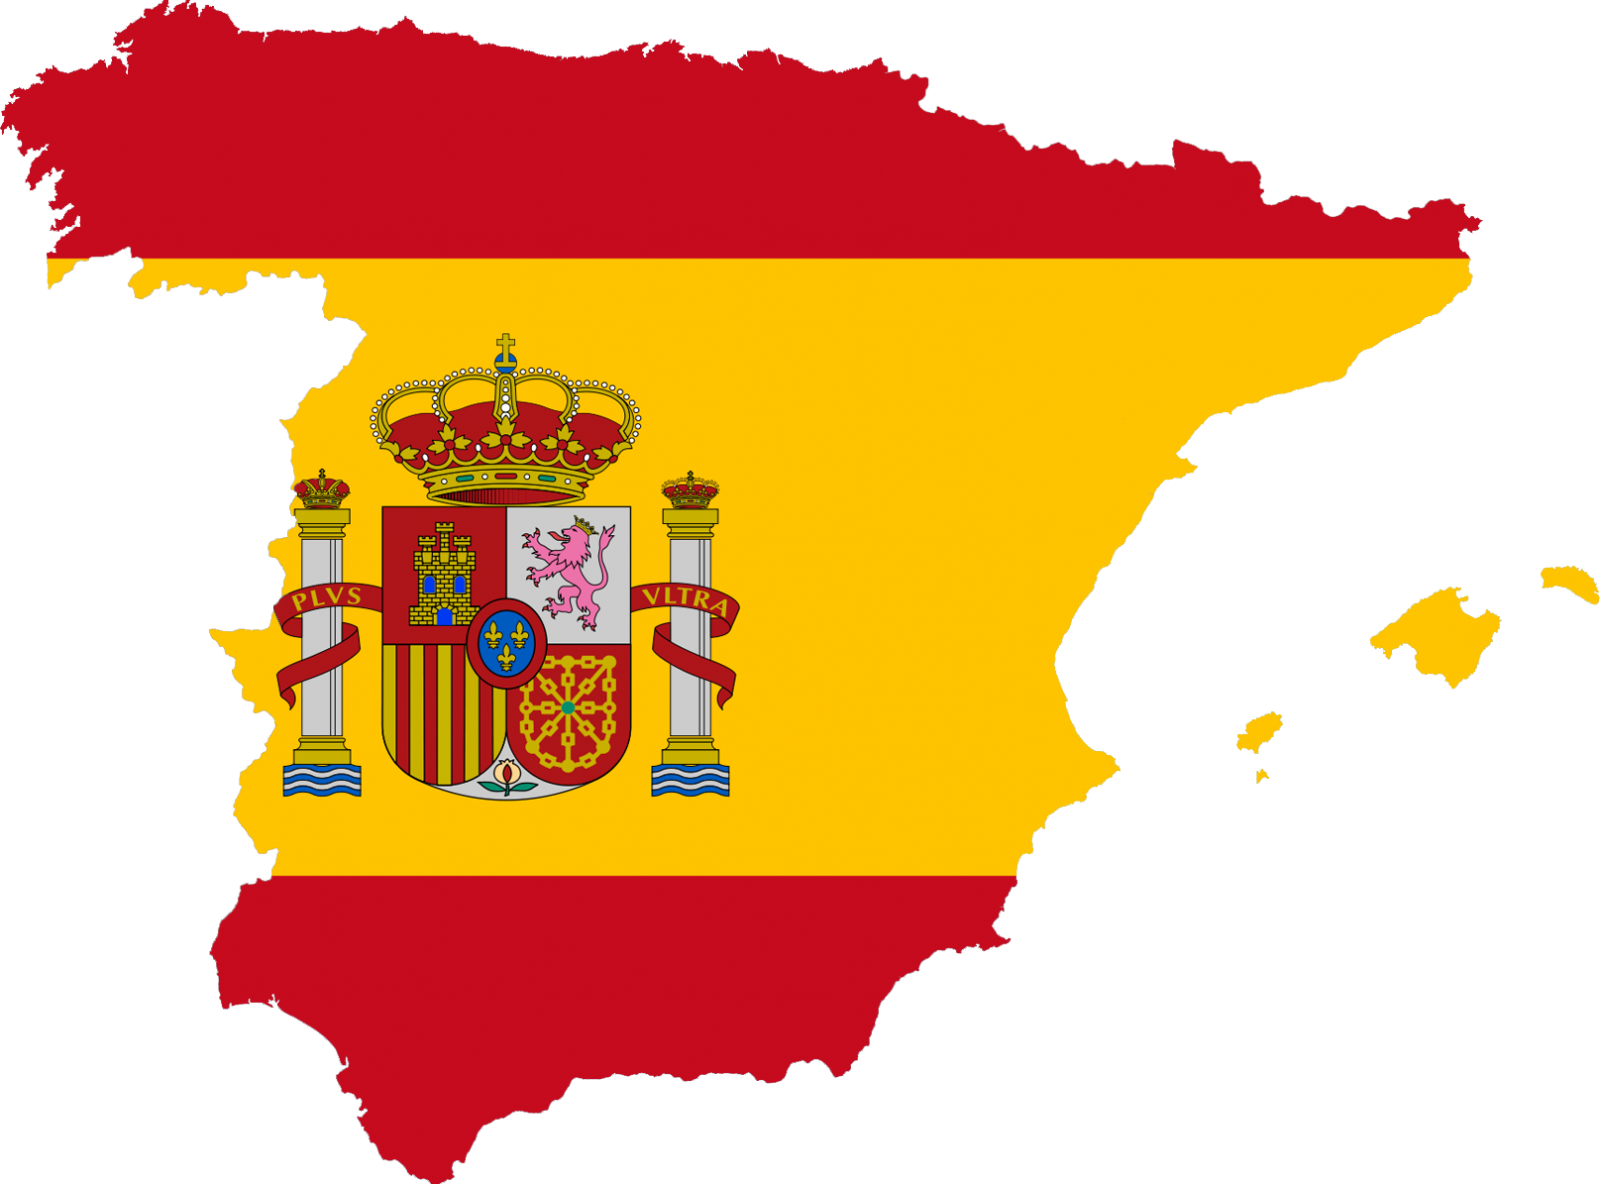 Spanje google zoeken spains. Politics clipart political spectrum